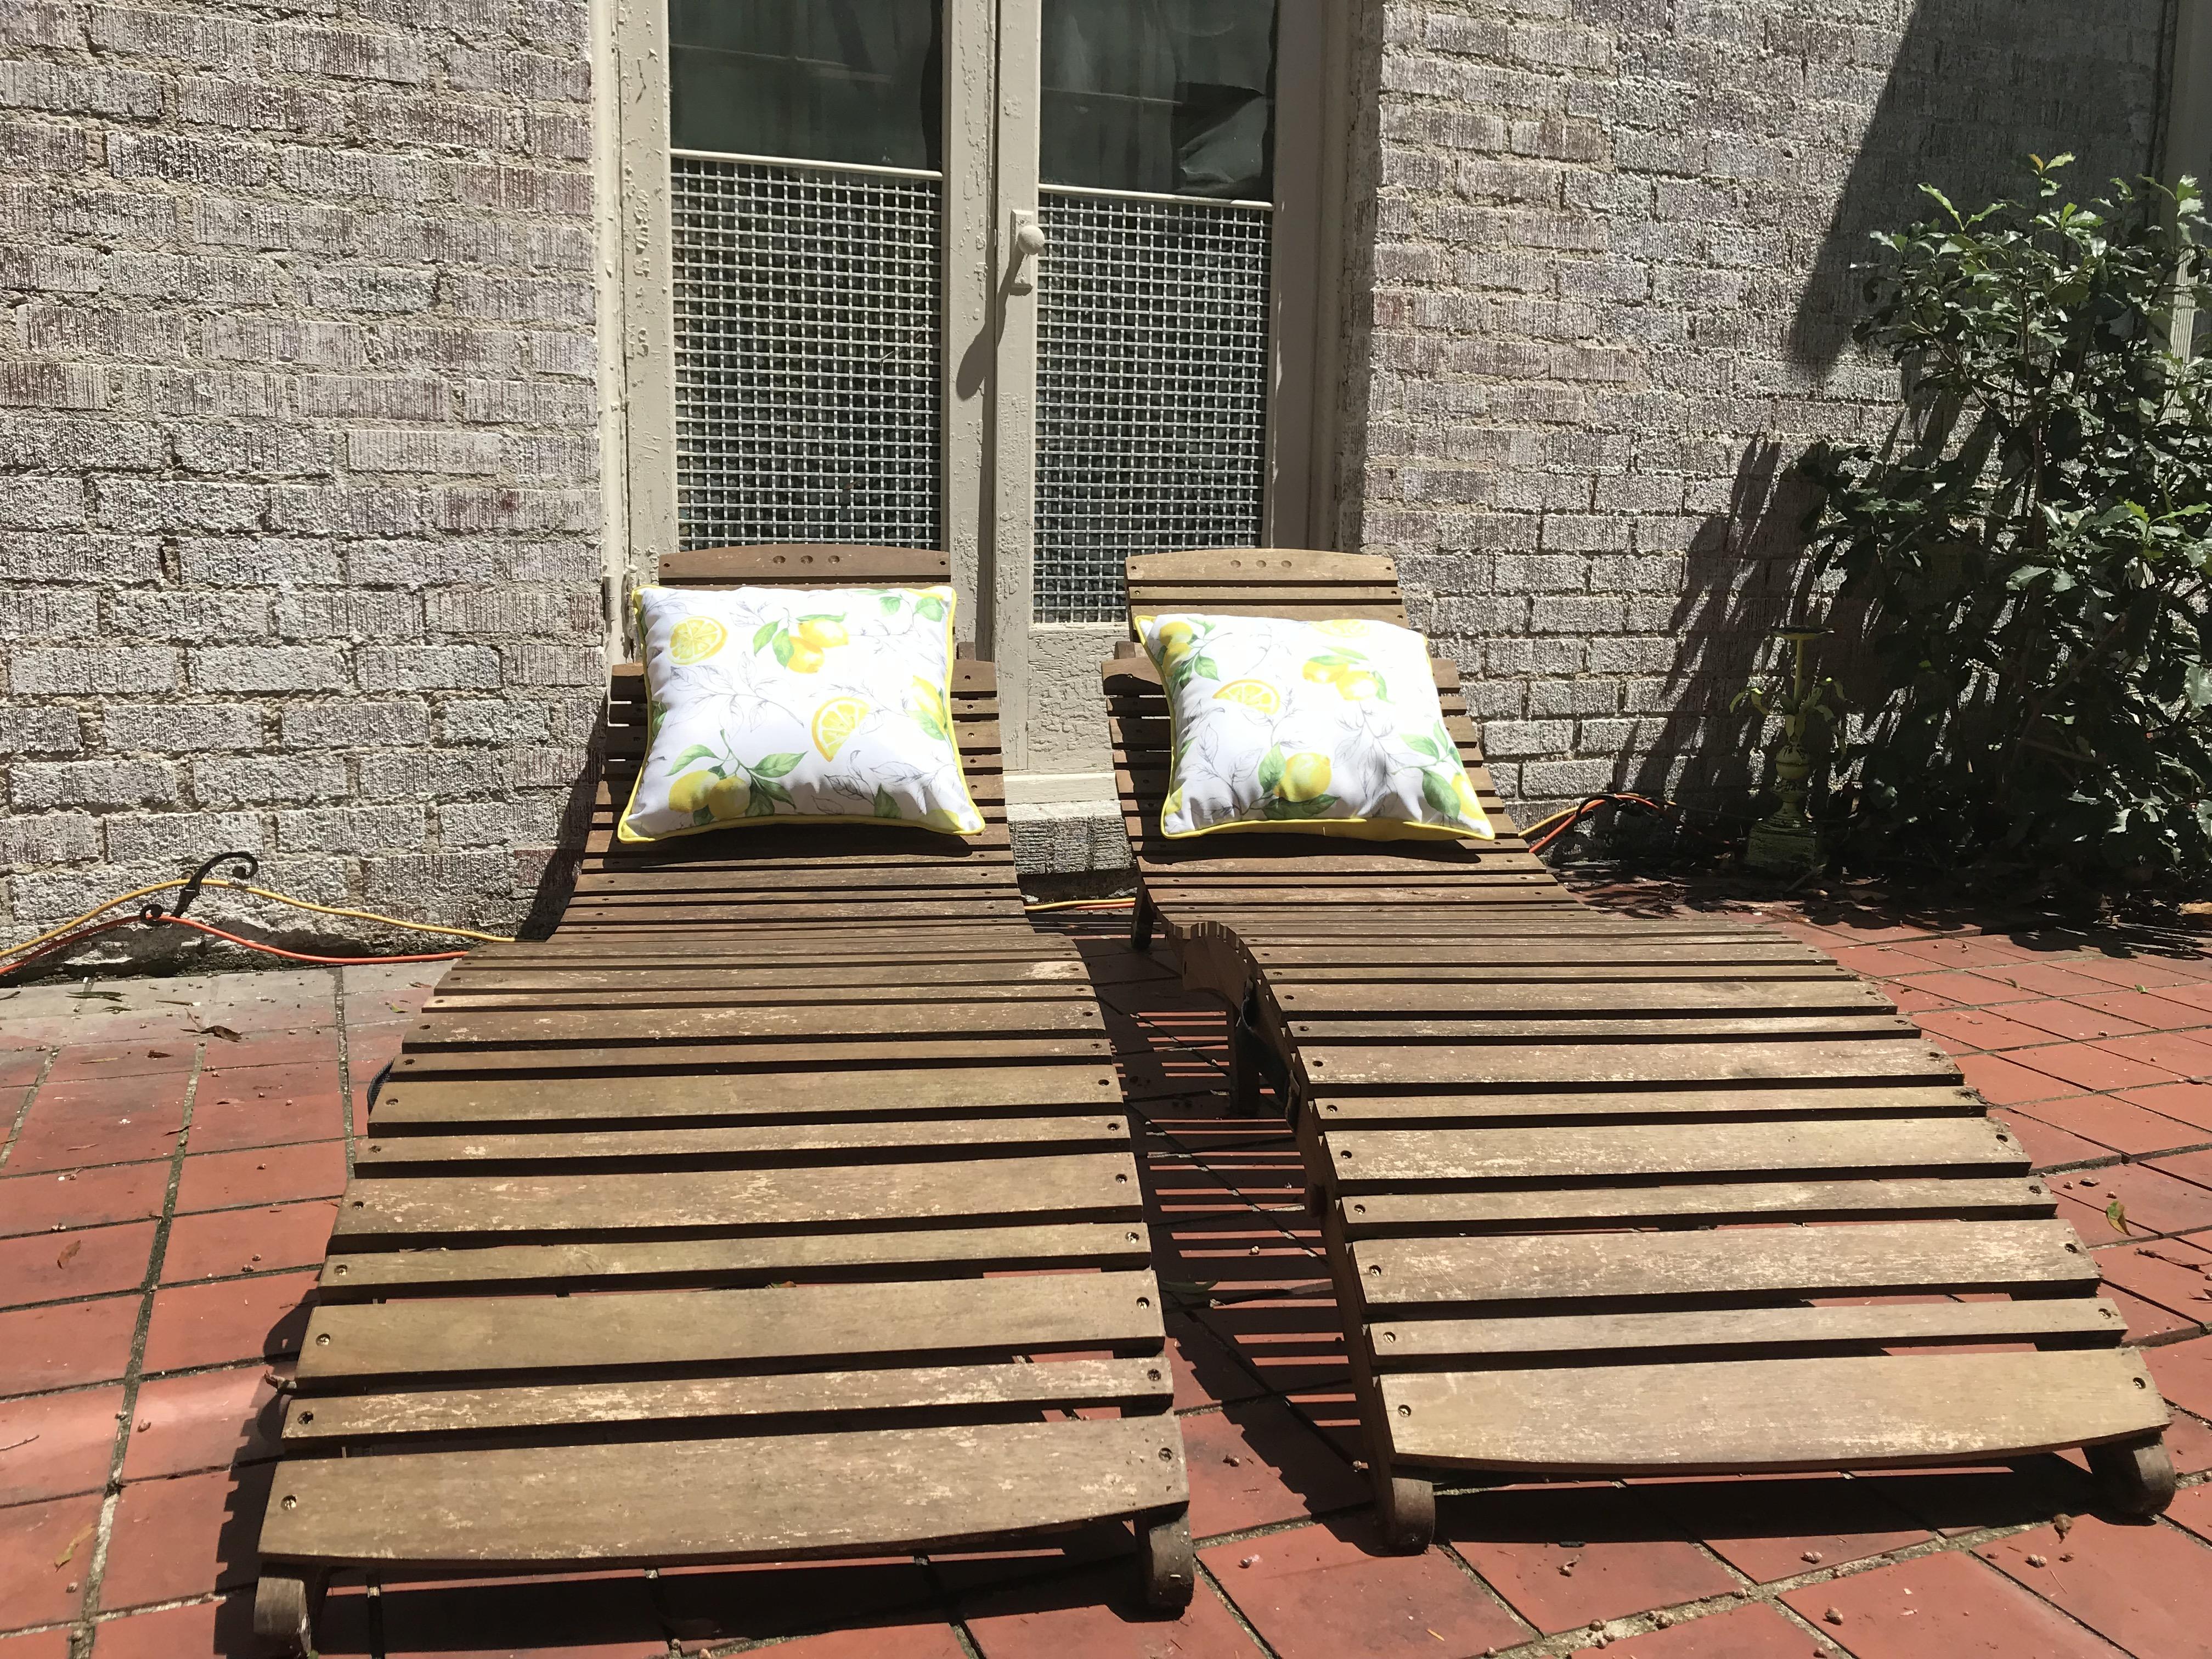 Courtyard Sunning